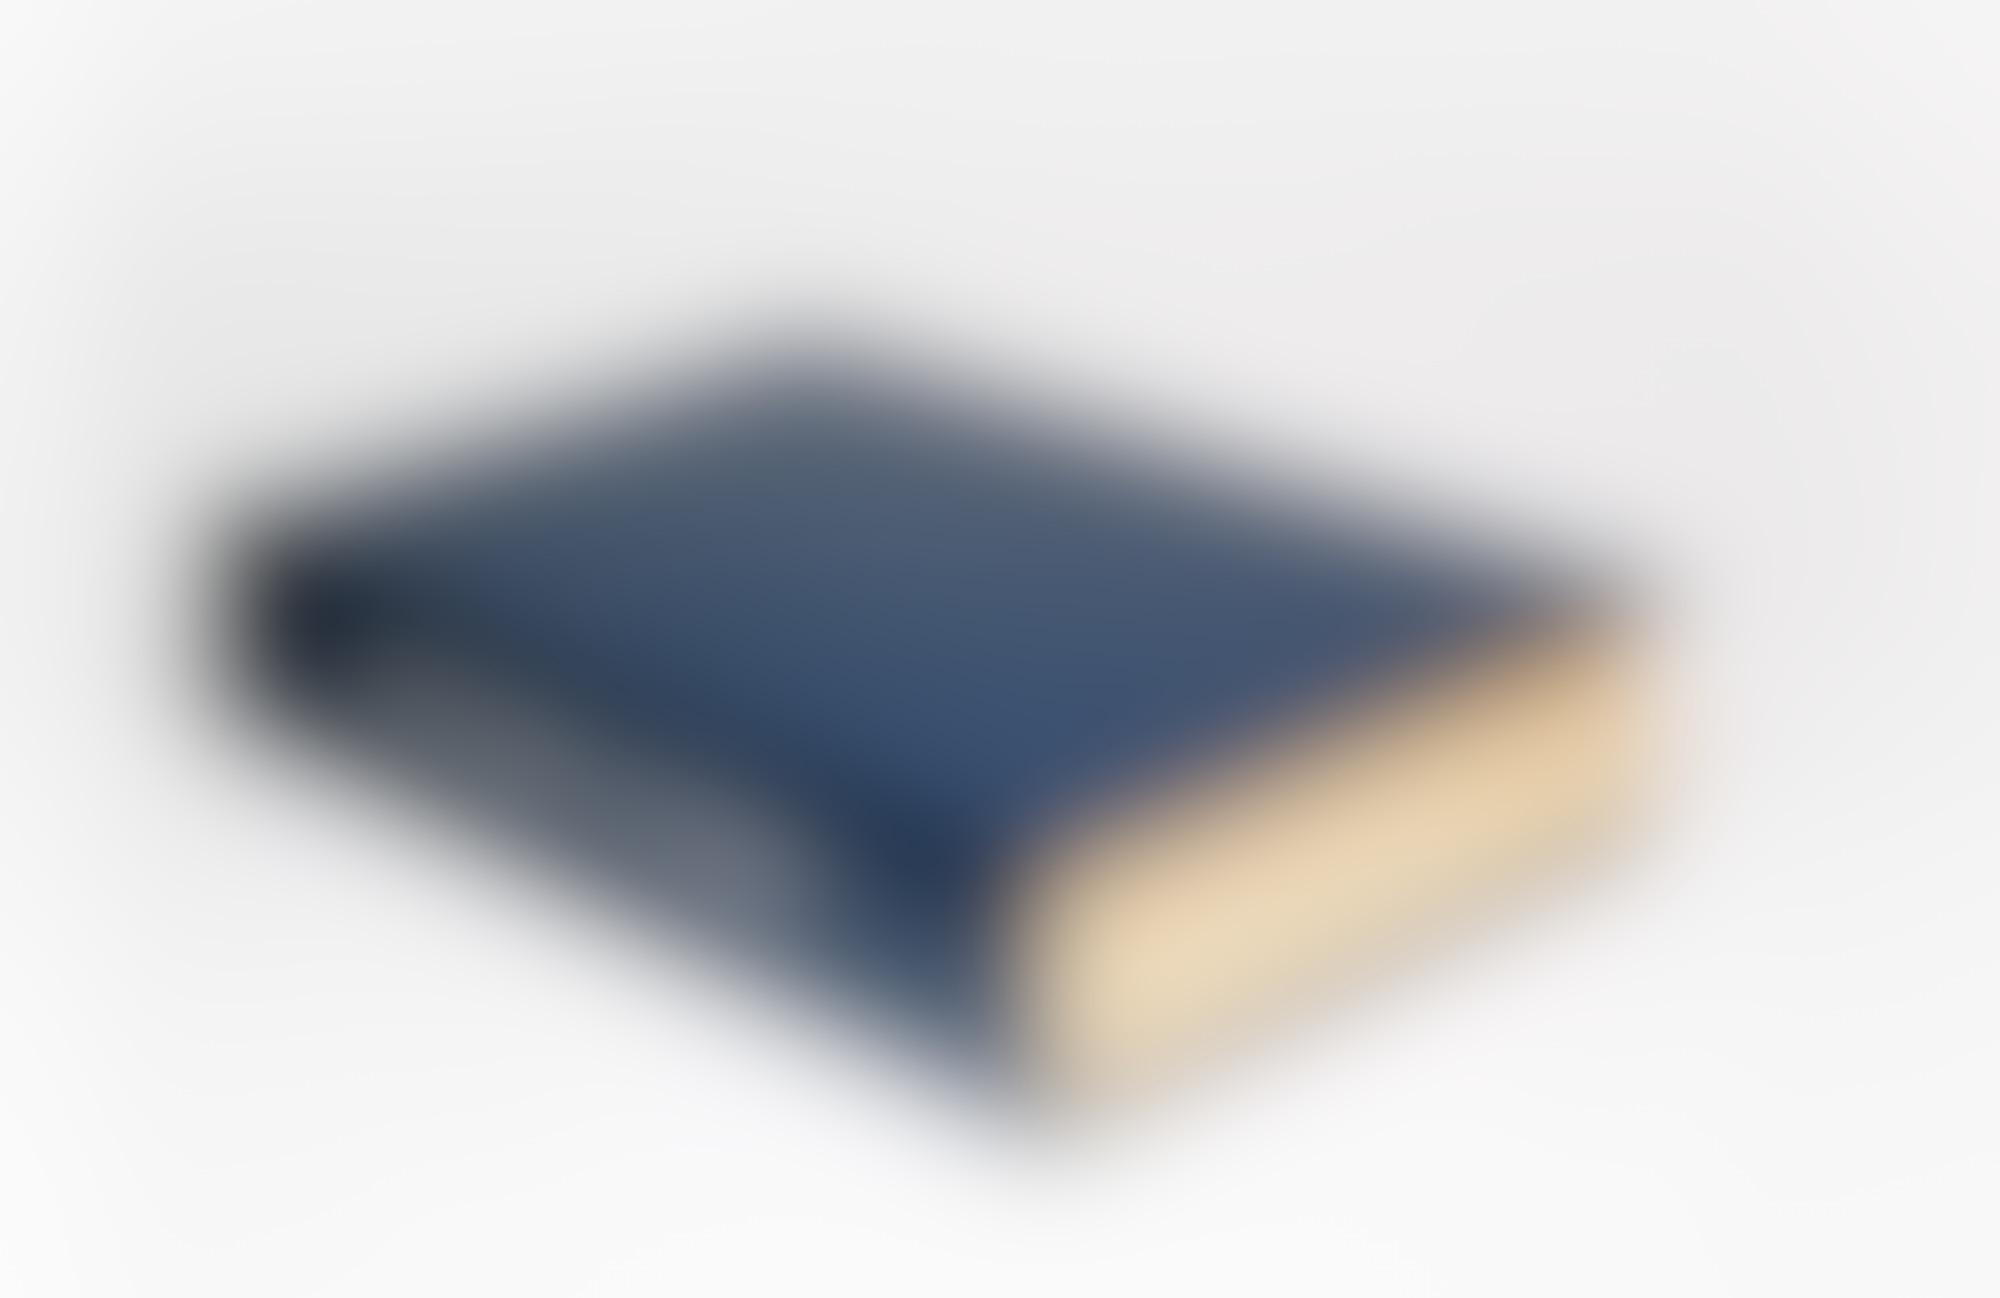 The Future of Books 2 autocompressfitresizeixlibphp 1 1 0max h2000max w3 D2000q80sb763b197aa3496a9488e4c04016806b8